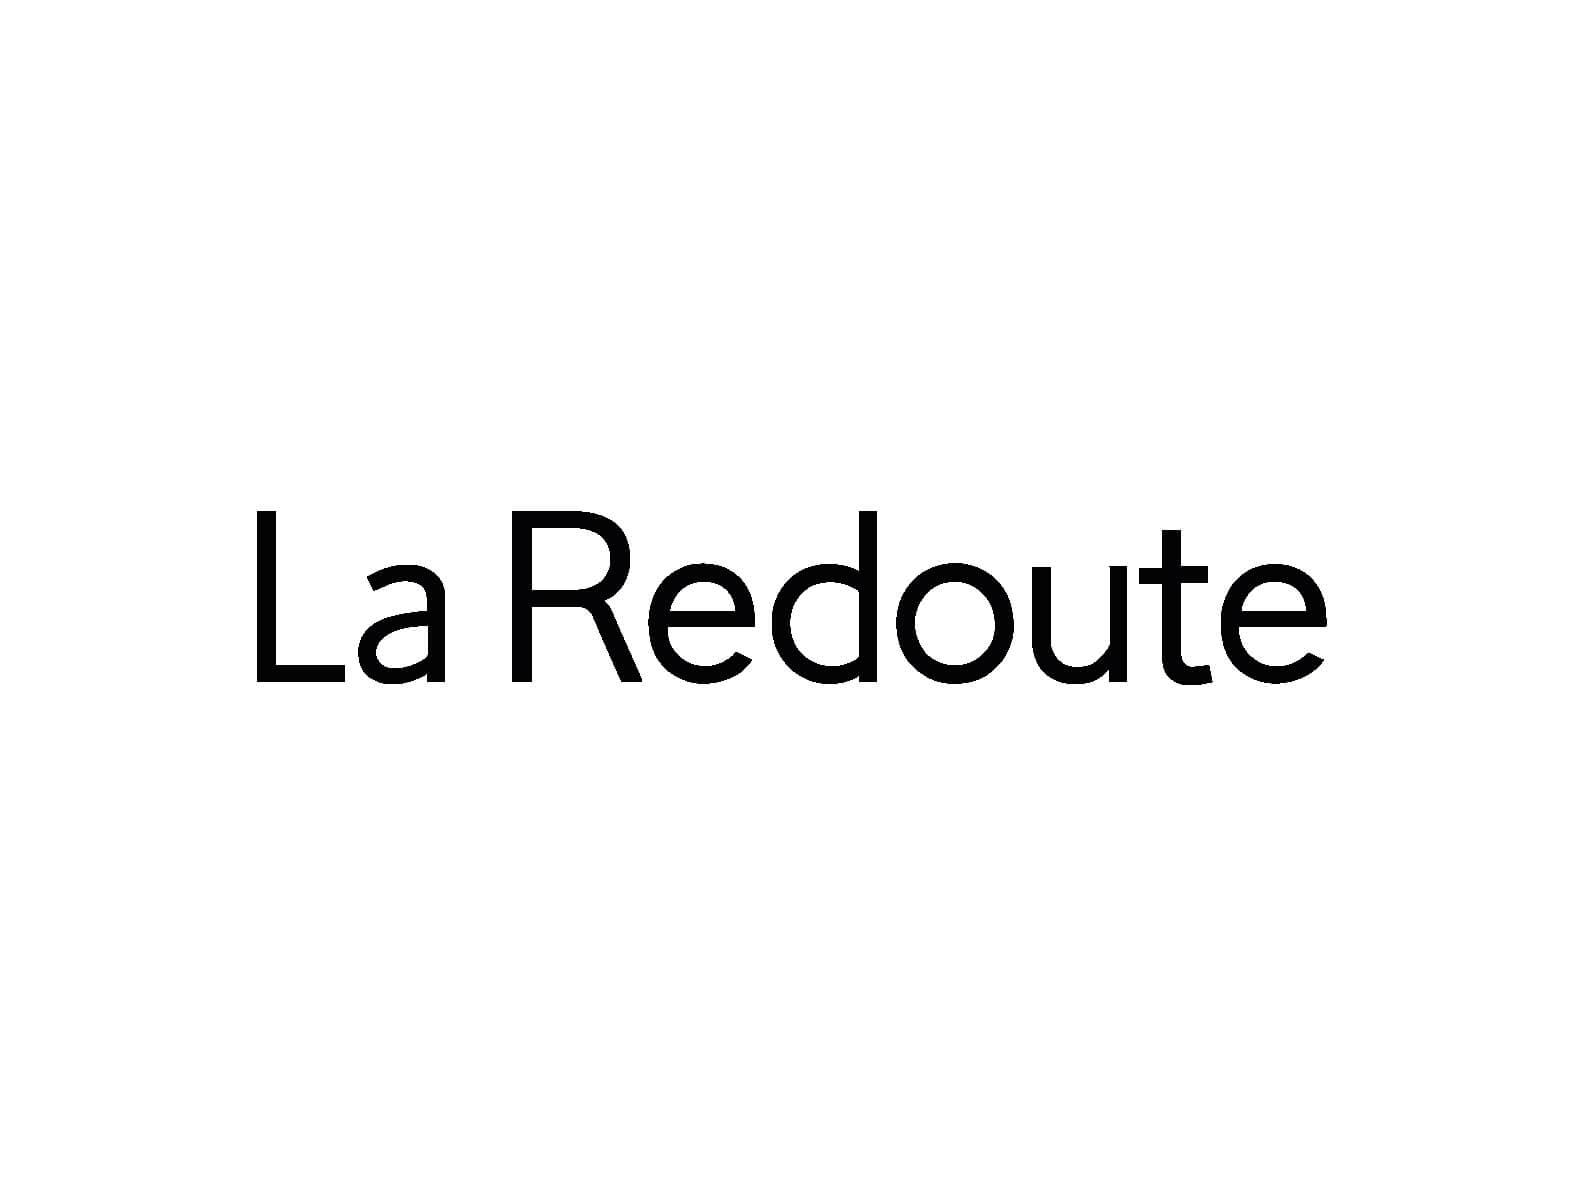 agence kayak communication web lille nord la redoute logo